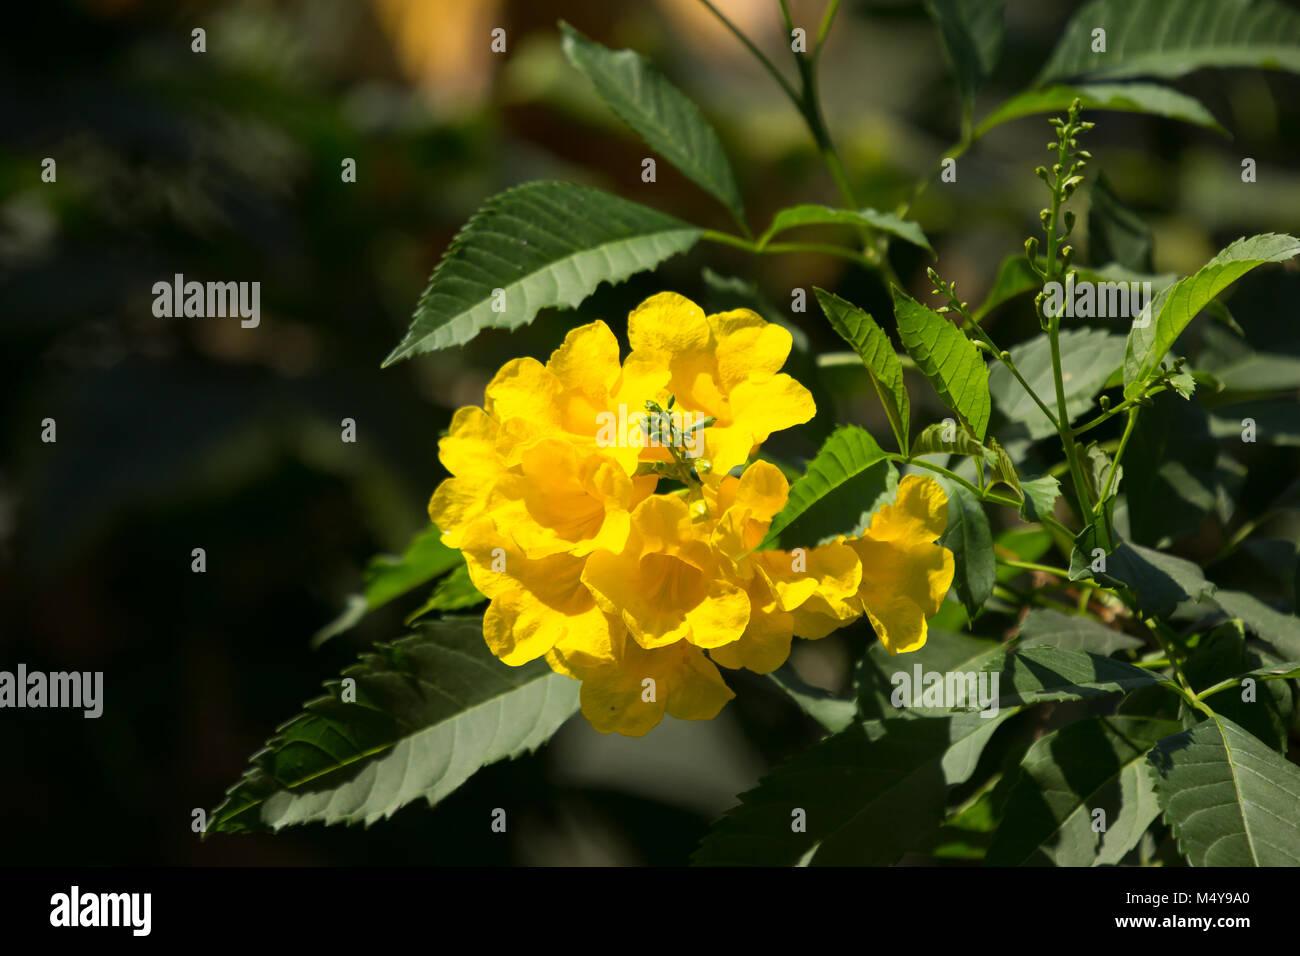 Close up of yellow flower yellow elder yellow bells or stock close up of yellow flower yellow elder yellow bells or trumpetflower scientific name istecoma stans mightylinksfo